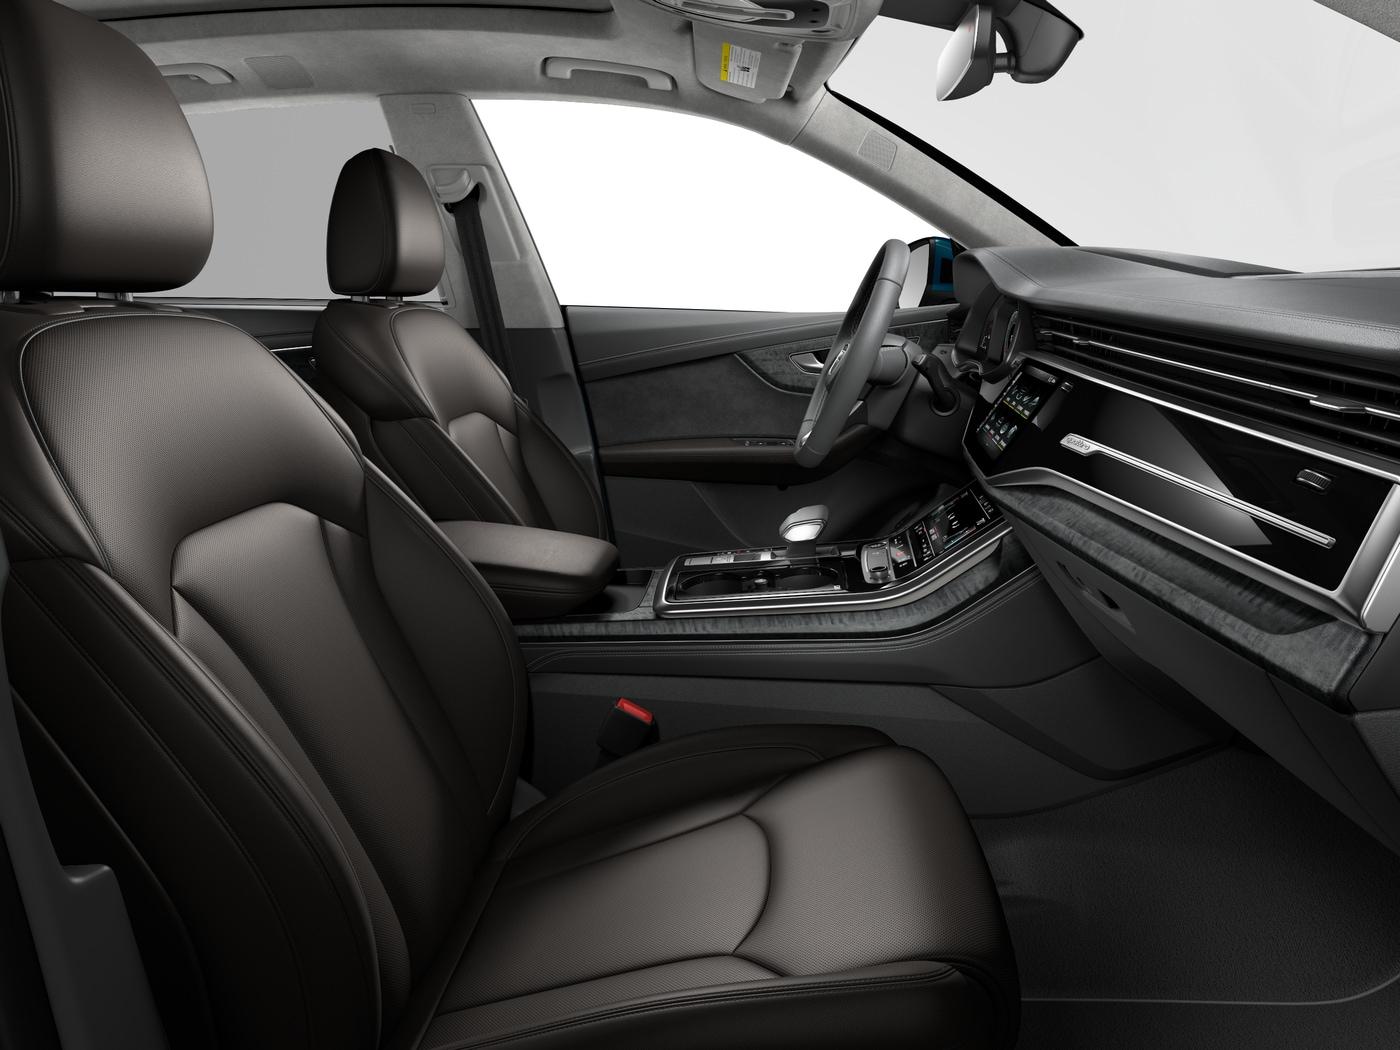 New 2021 Audi Q8 For Sale At Audi Dayton Vin Wa1fvaf19md012741